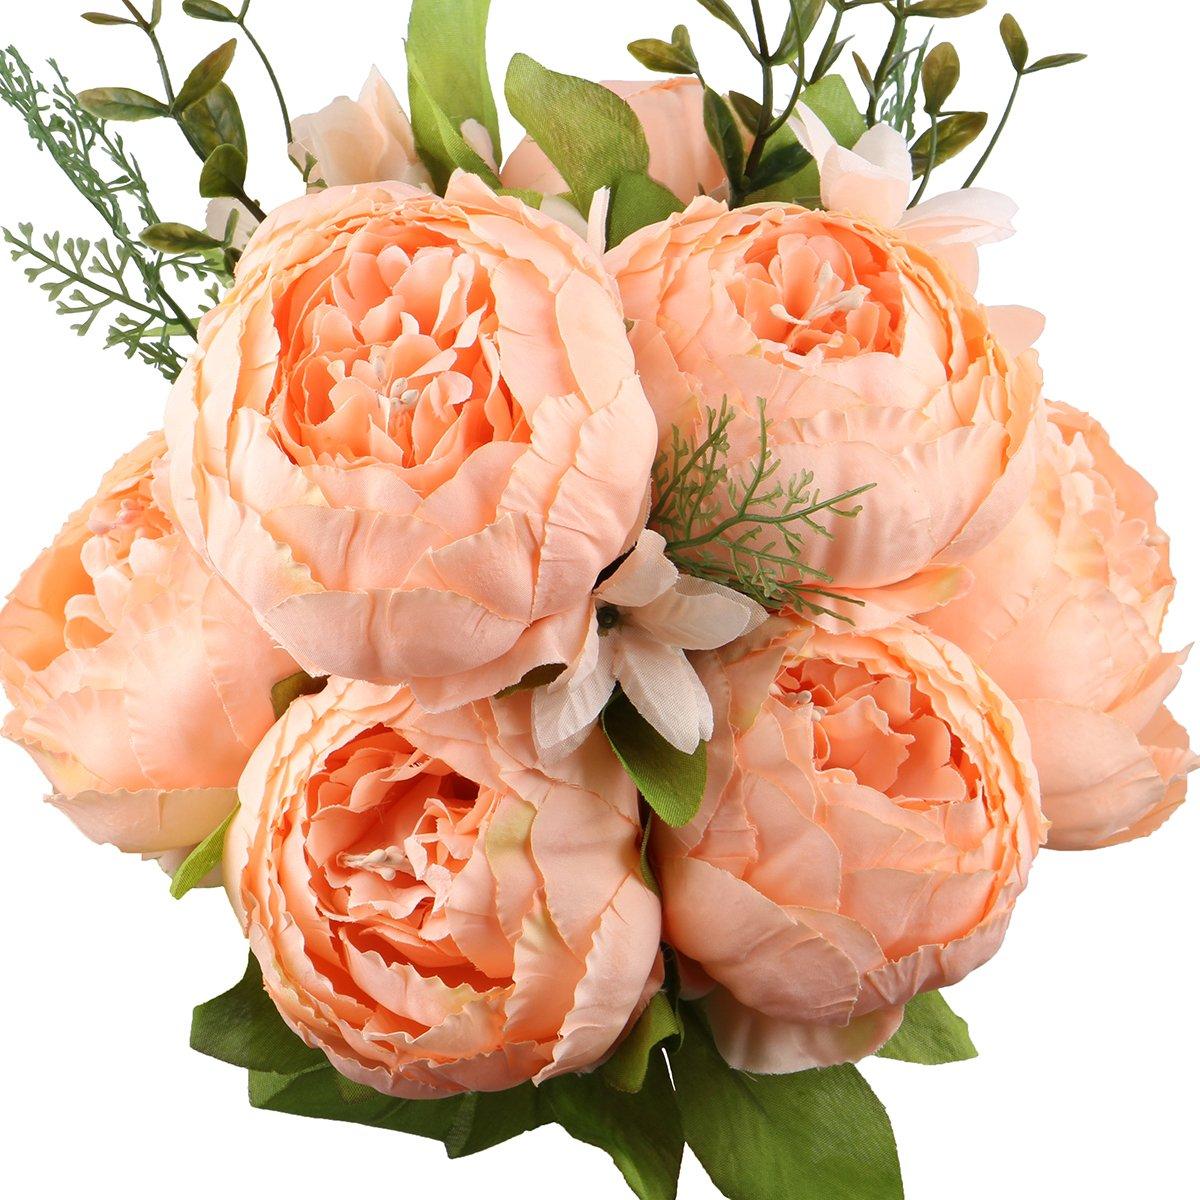 Leagel Fake Flowers Vintage Artificial Peony Silk Bouquet Wedding